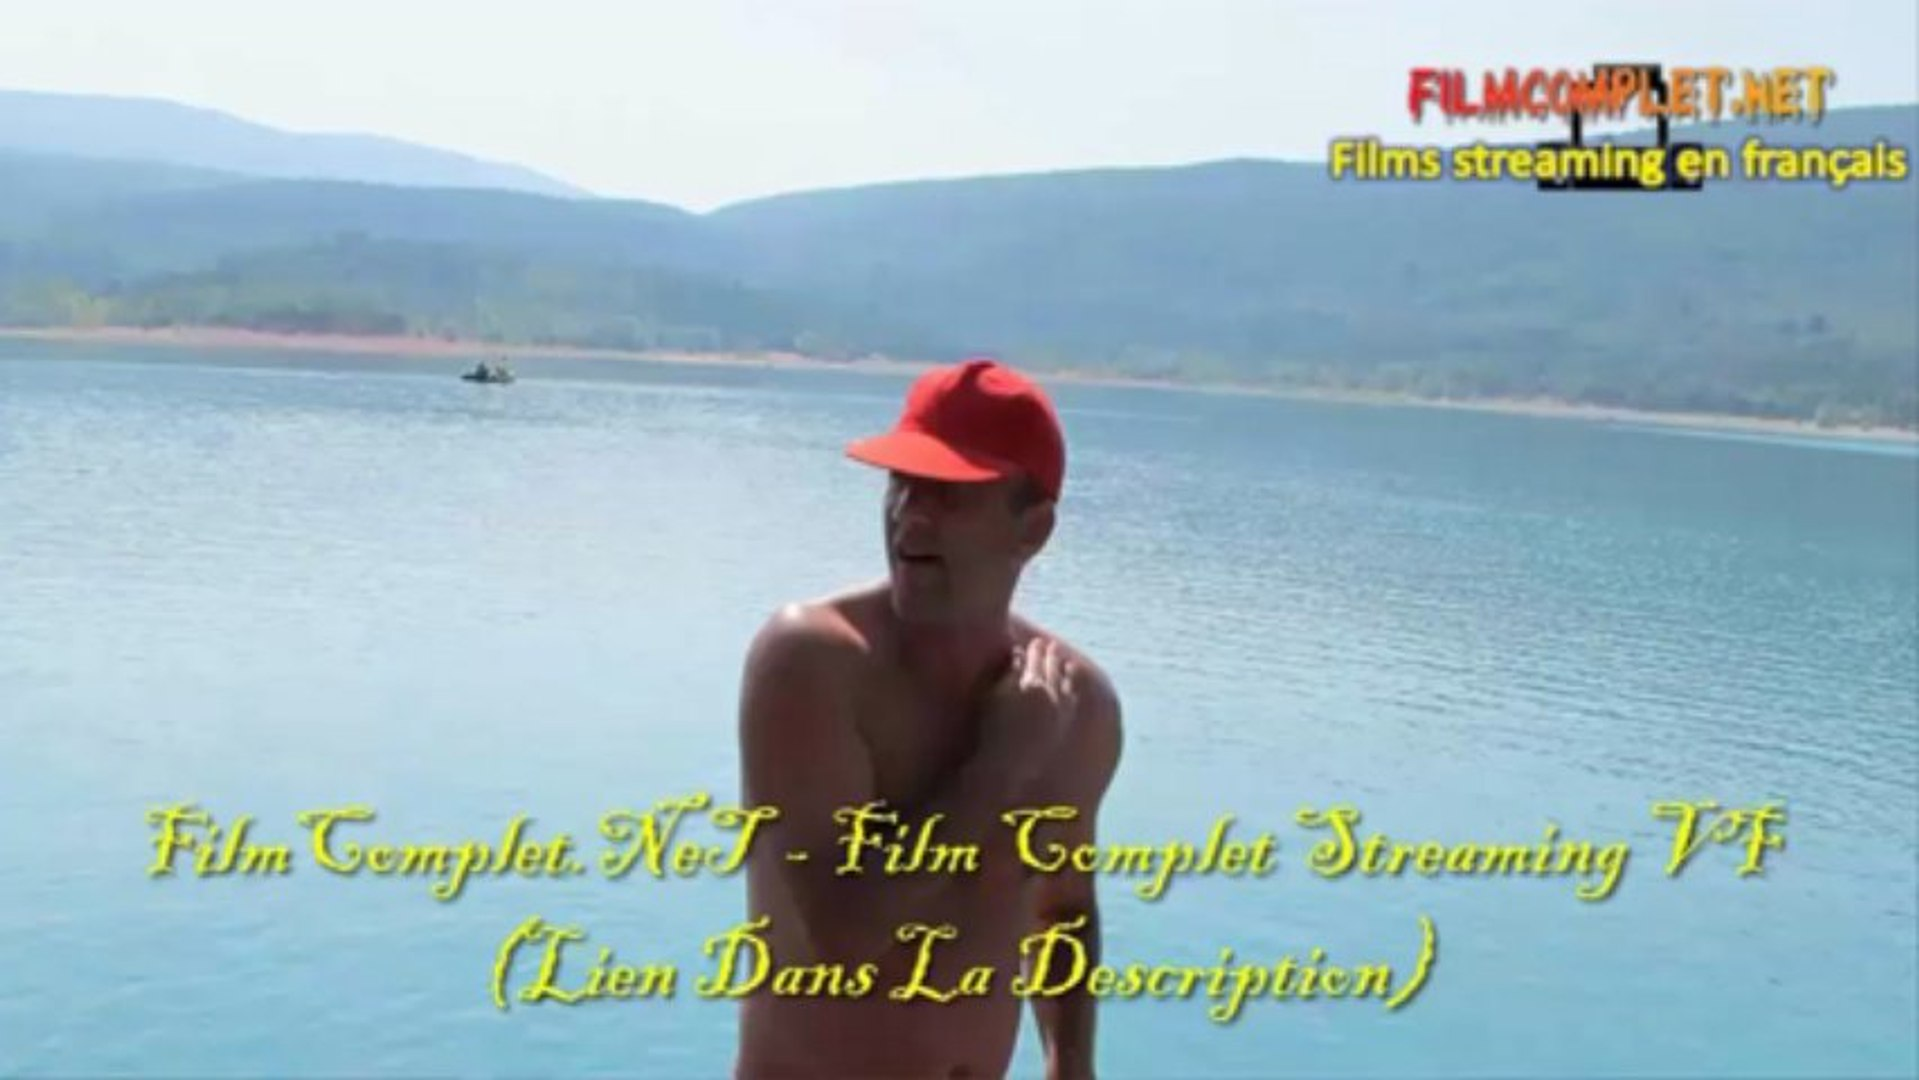 L Inconnu Du Lac Streaming Vf Film Complet Francais En Ligne Video Dailymotion